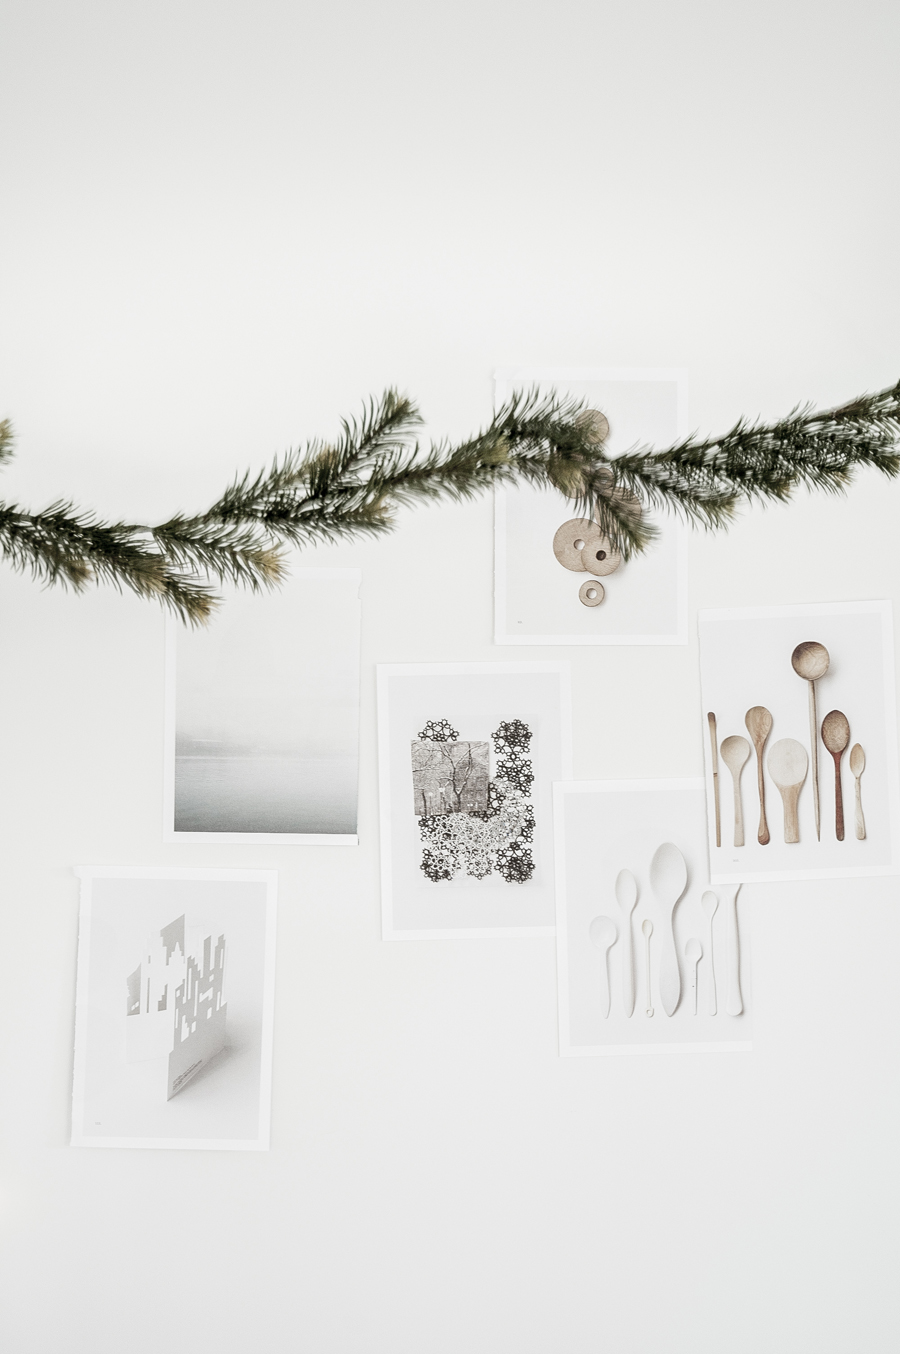 ikea-christmas-diy-aprilandmay-2